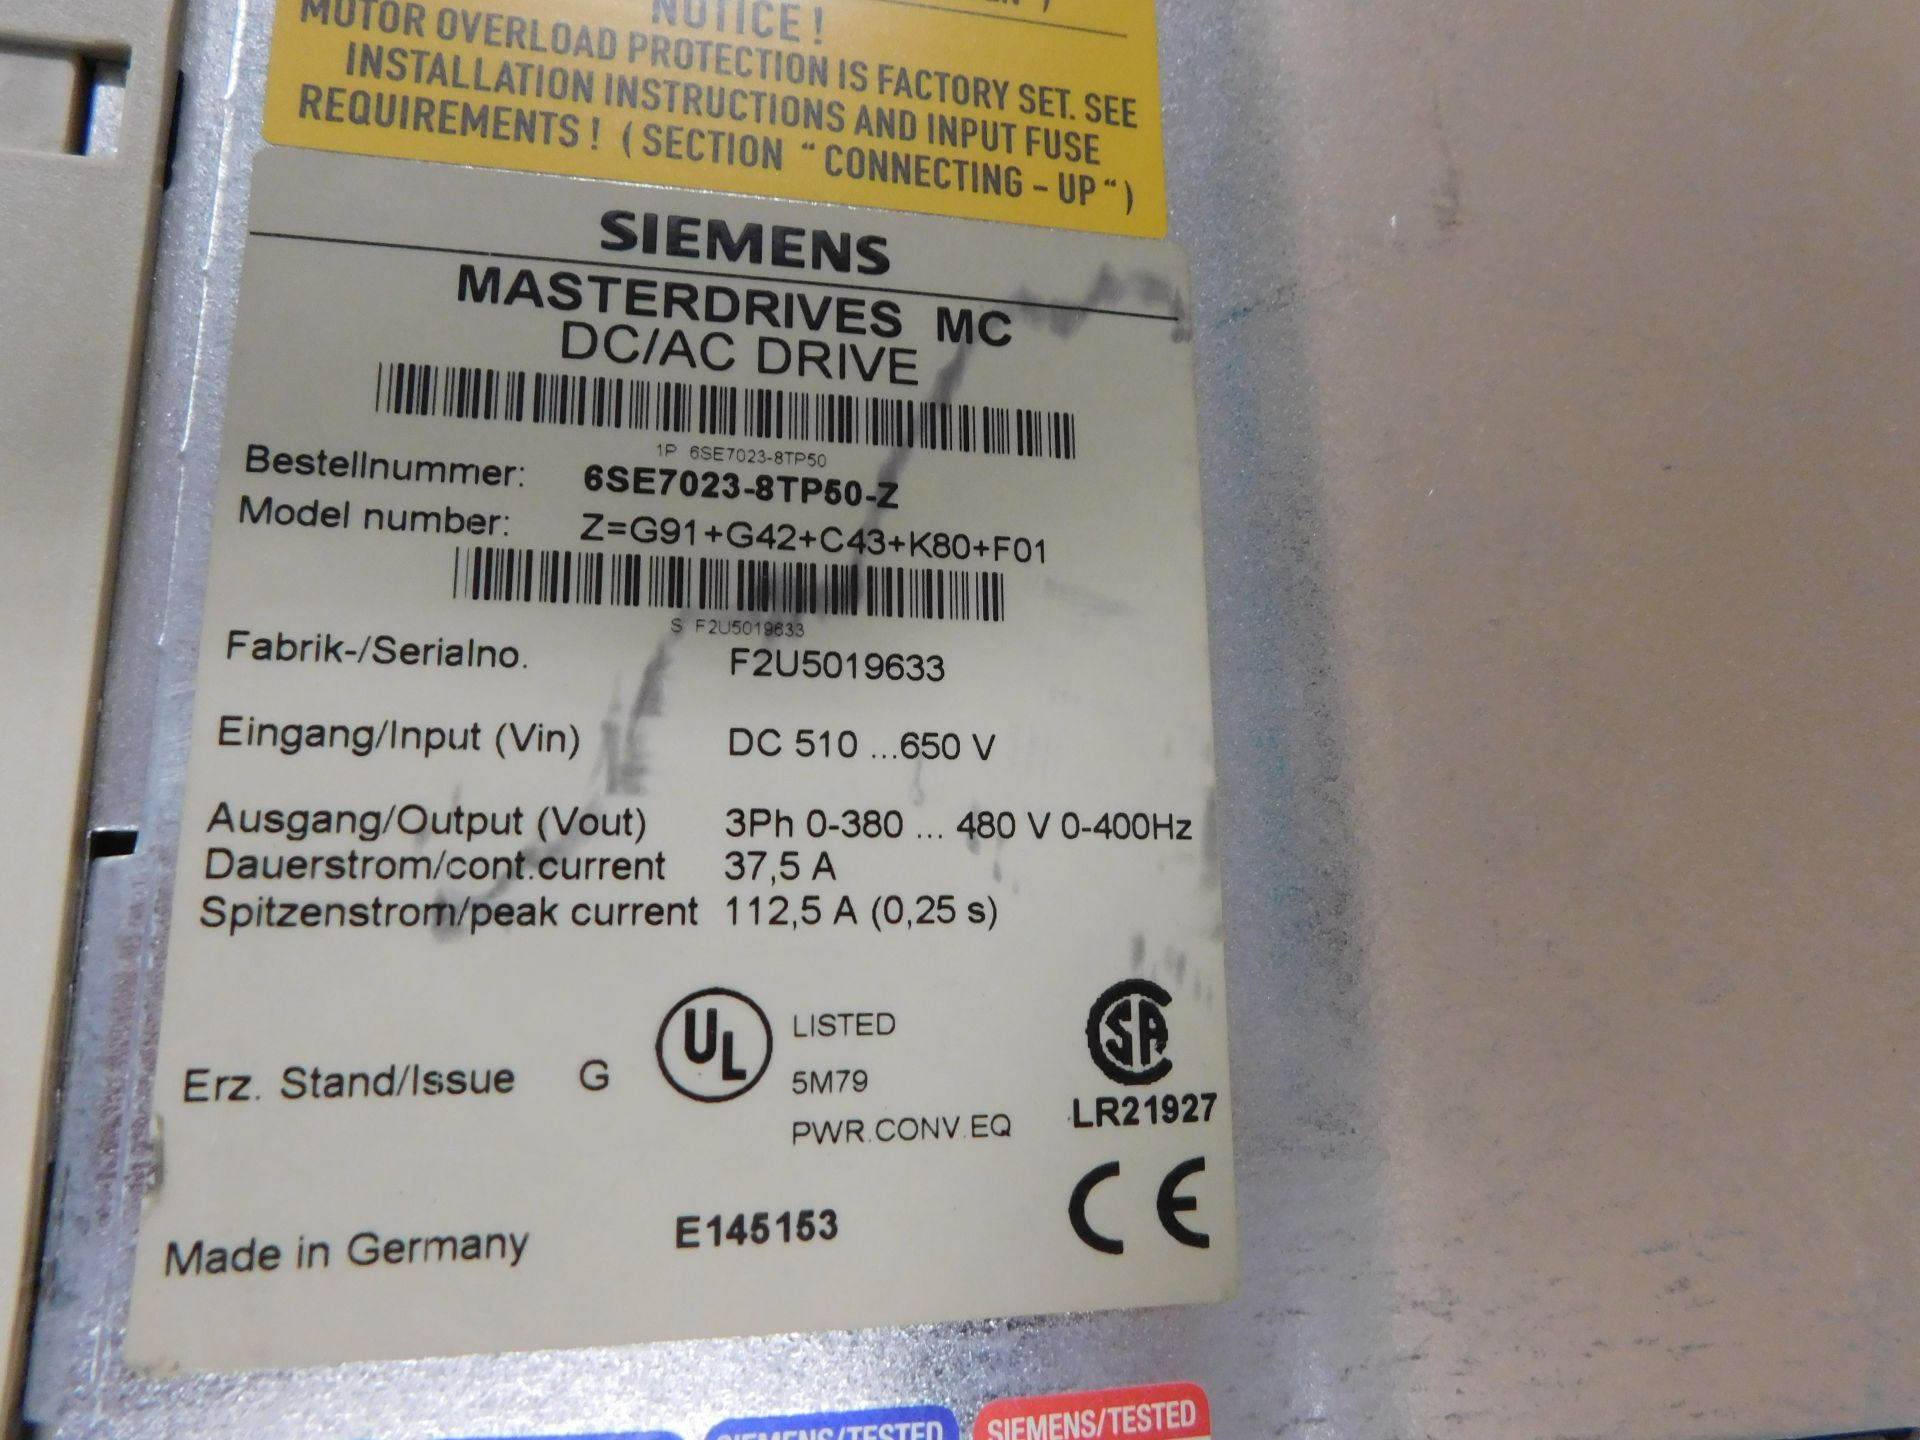 SIEMENS MASTERDRIVES MC DC/AC DRIVE - Image 3 of 5